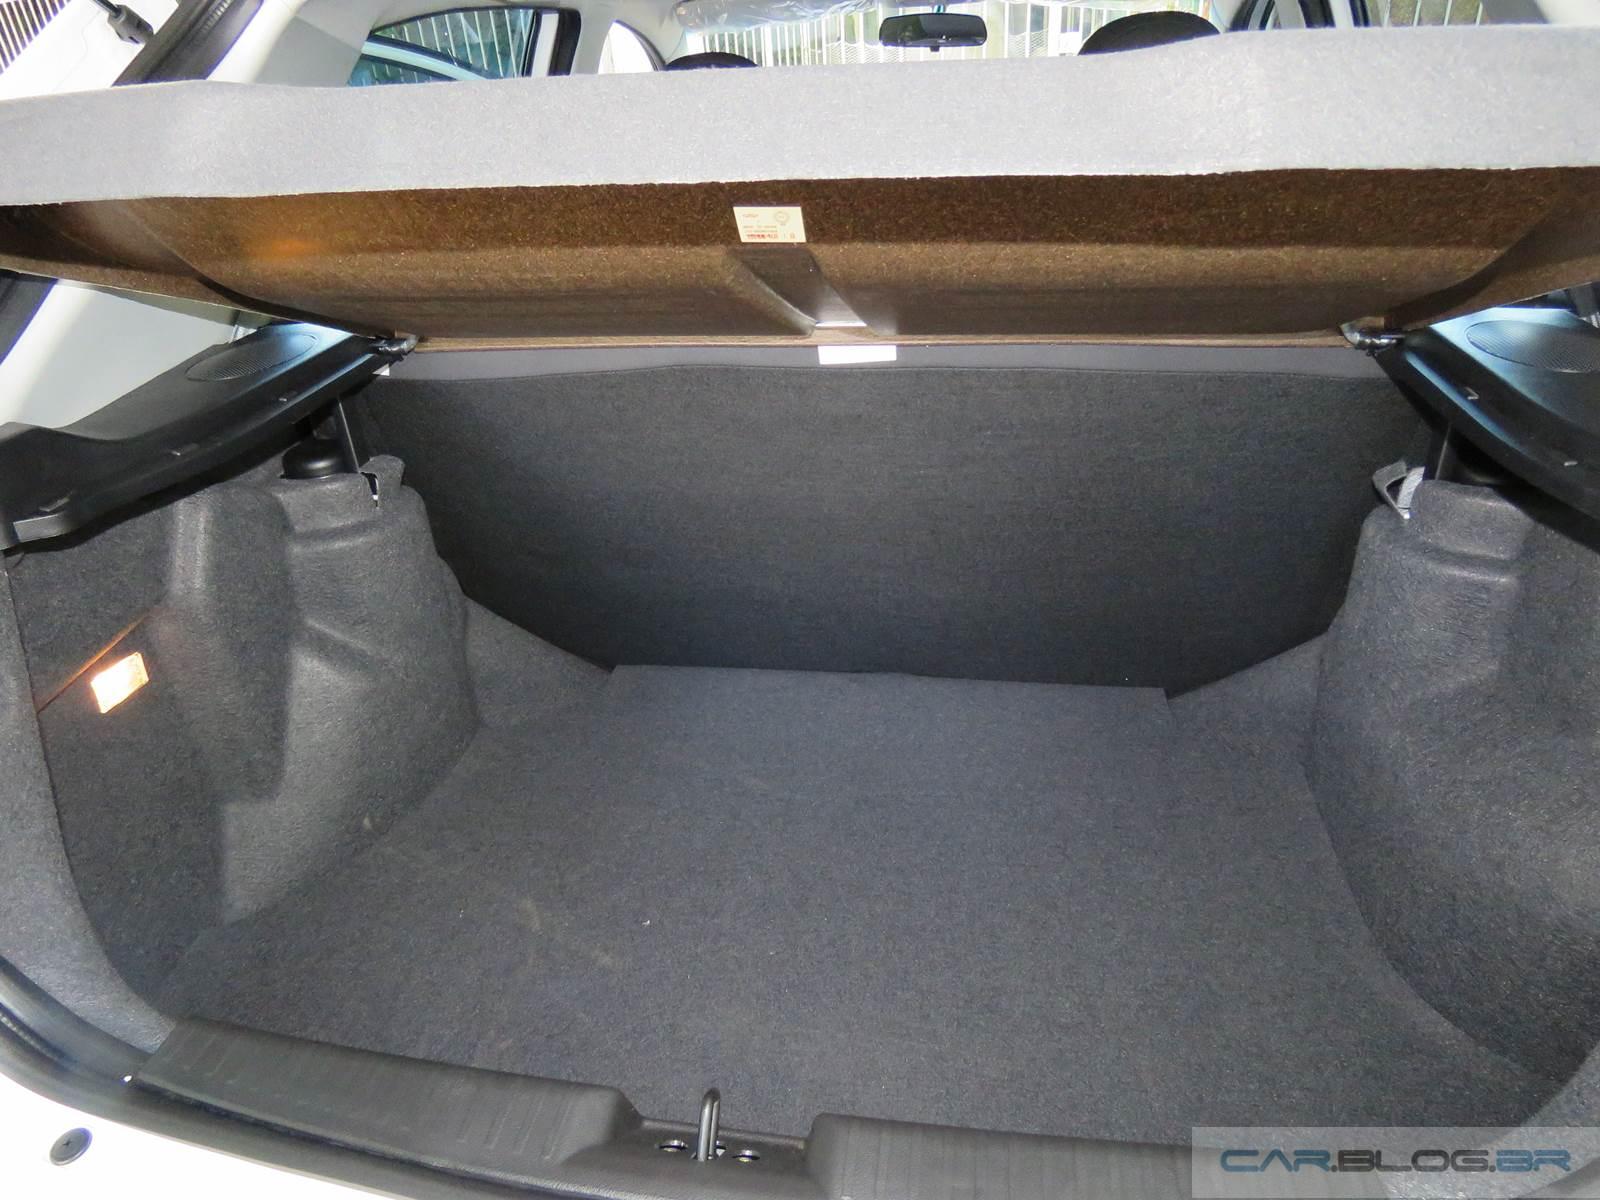 Chery Celer 1.5 Flex x VW Gol 2015 - interior - porta-malas